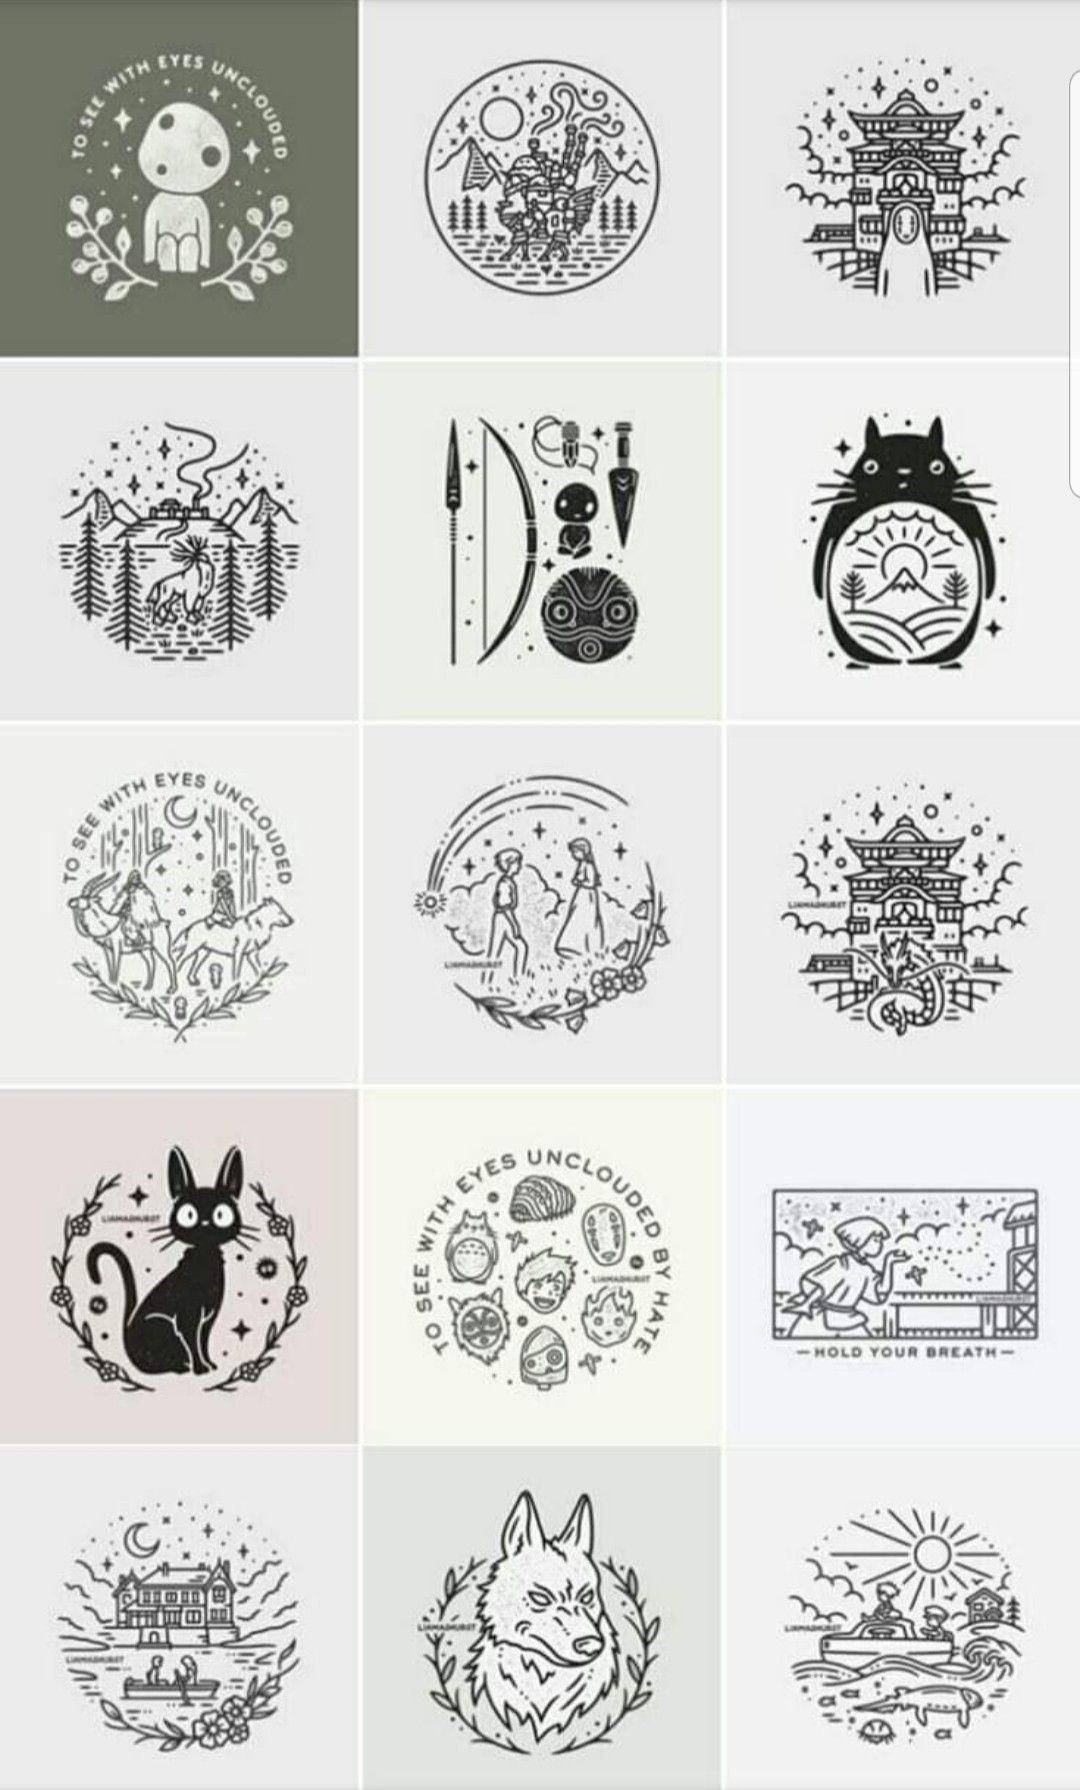 Pin By Aly Bates On Tattoos Ghibli Tattoo Studio Ghibli Tattoo Studio Ghibli